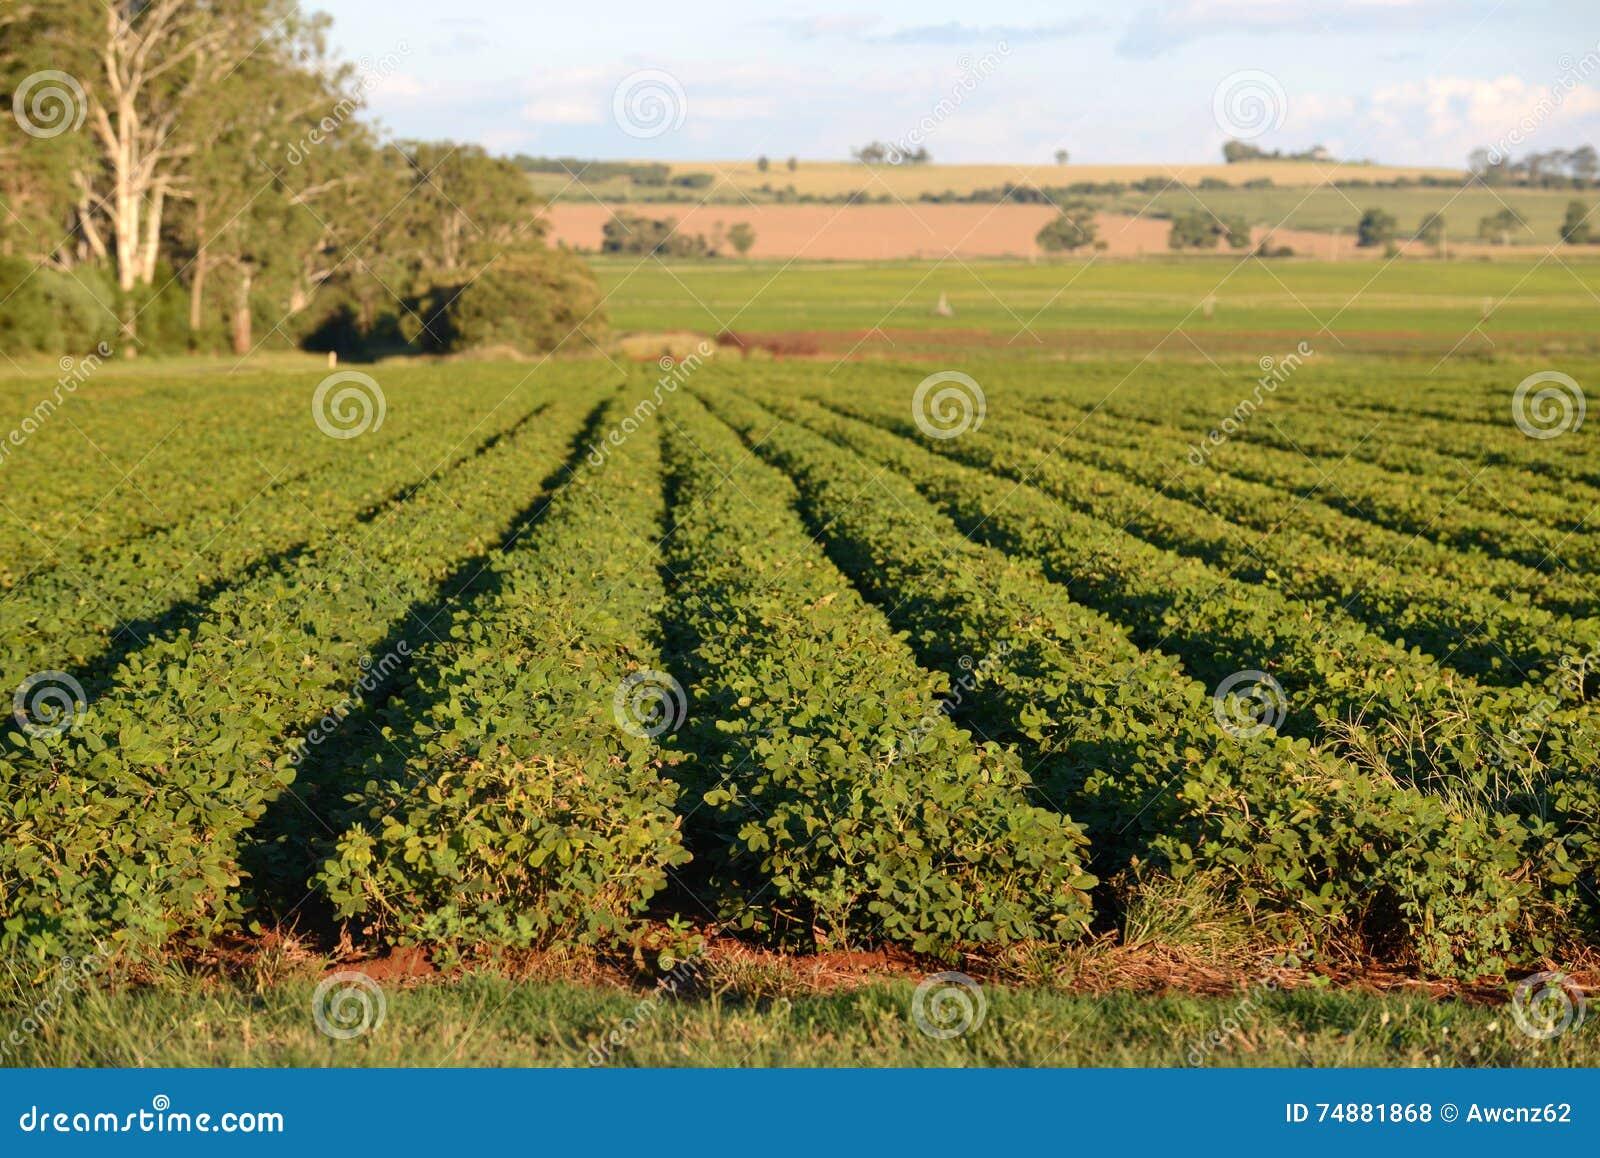 Peanut crop stock photo. Image of order, peanuts, kingaroy ... - photo#48